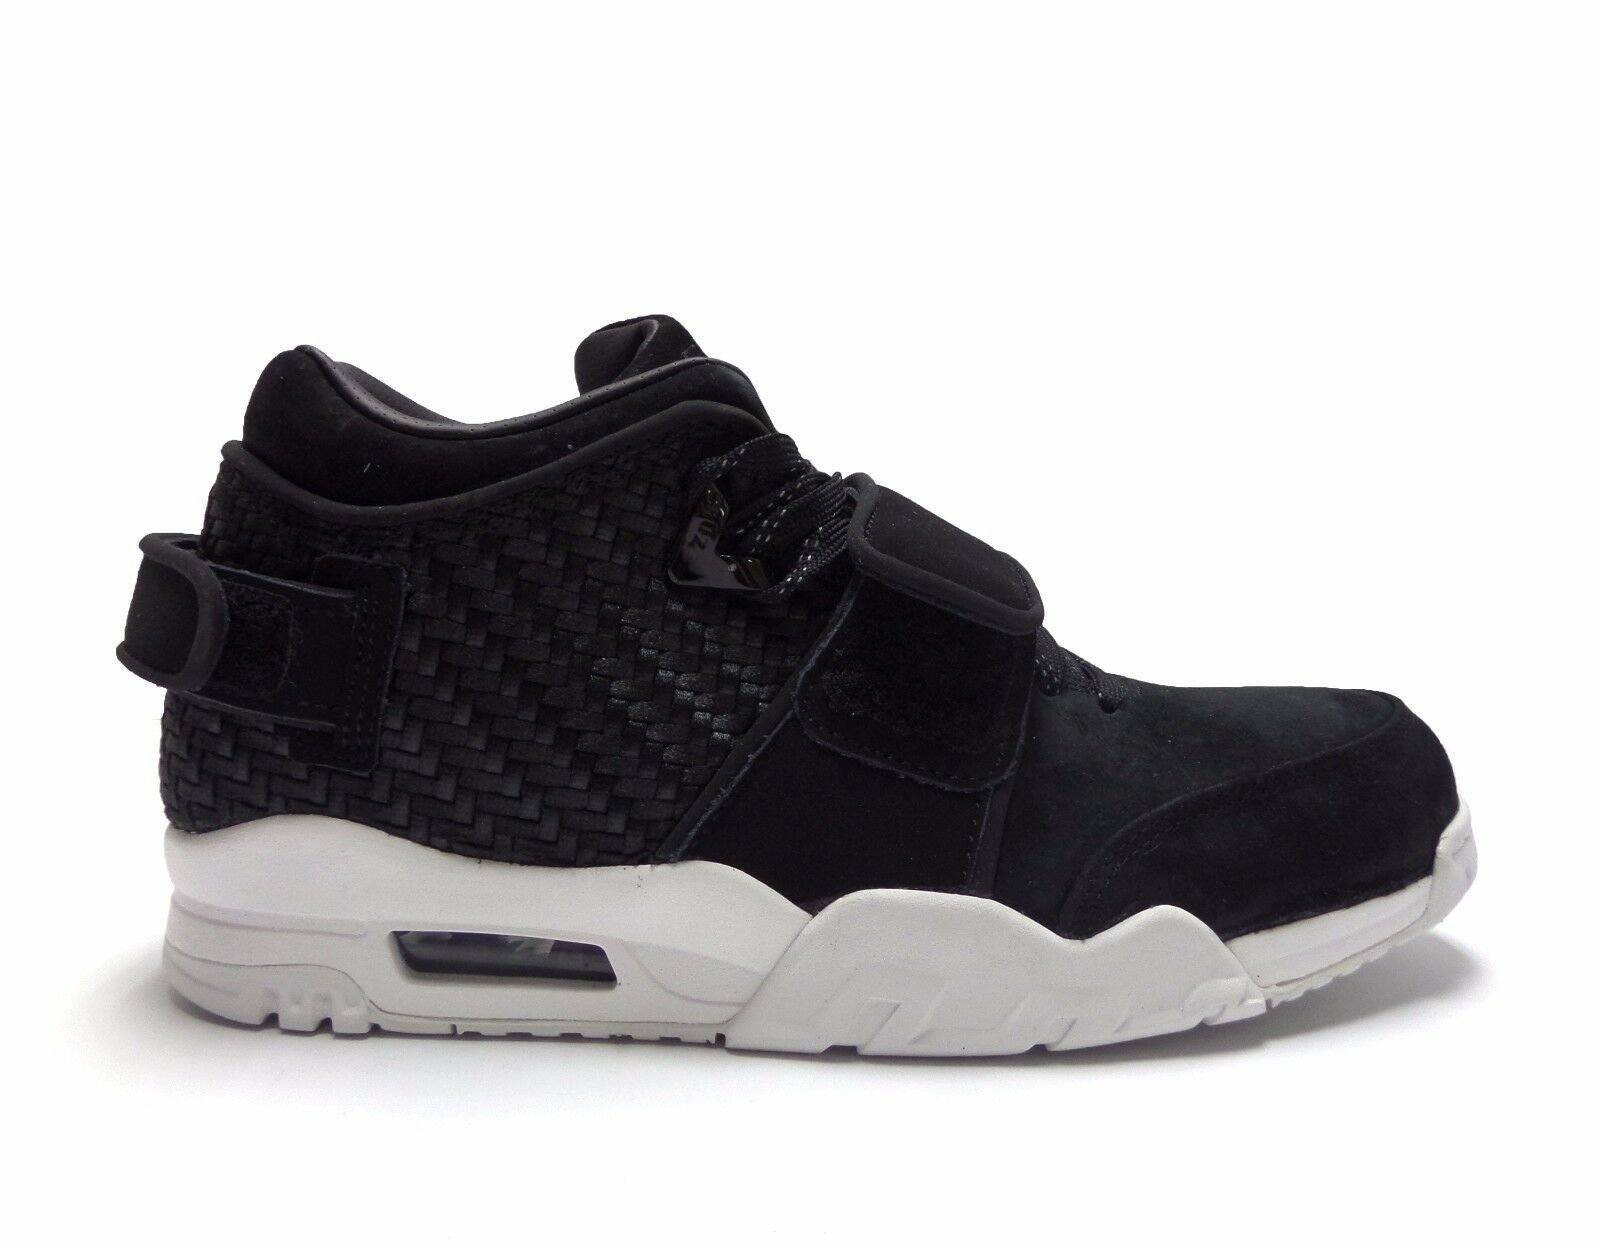 Nike Men's AIR TRAINER VICTOR CRUZ Black Suede Shoes 777535-004 a Seasonal clearance sale